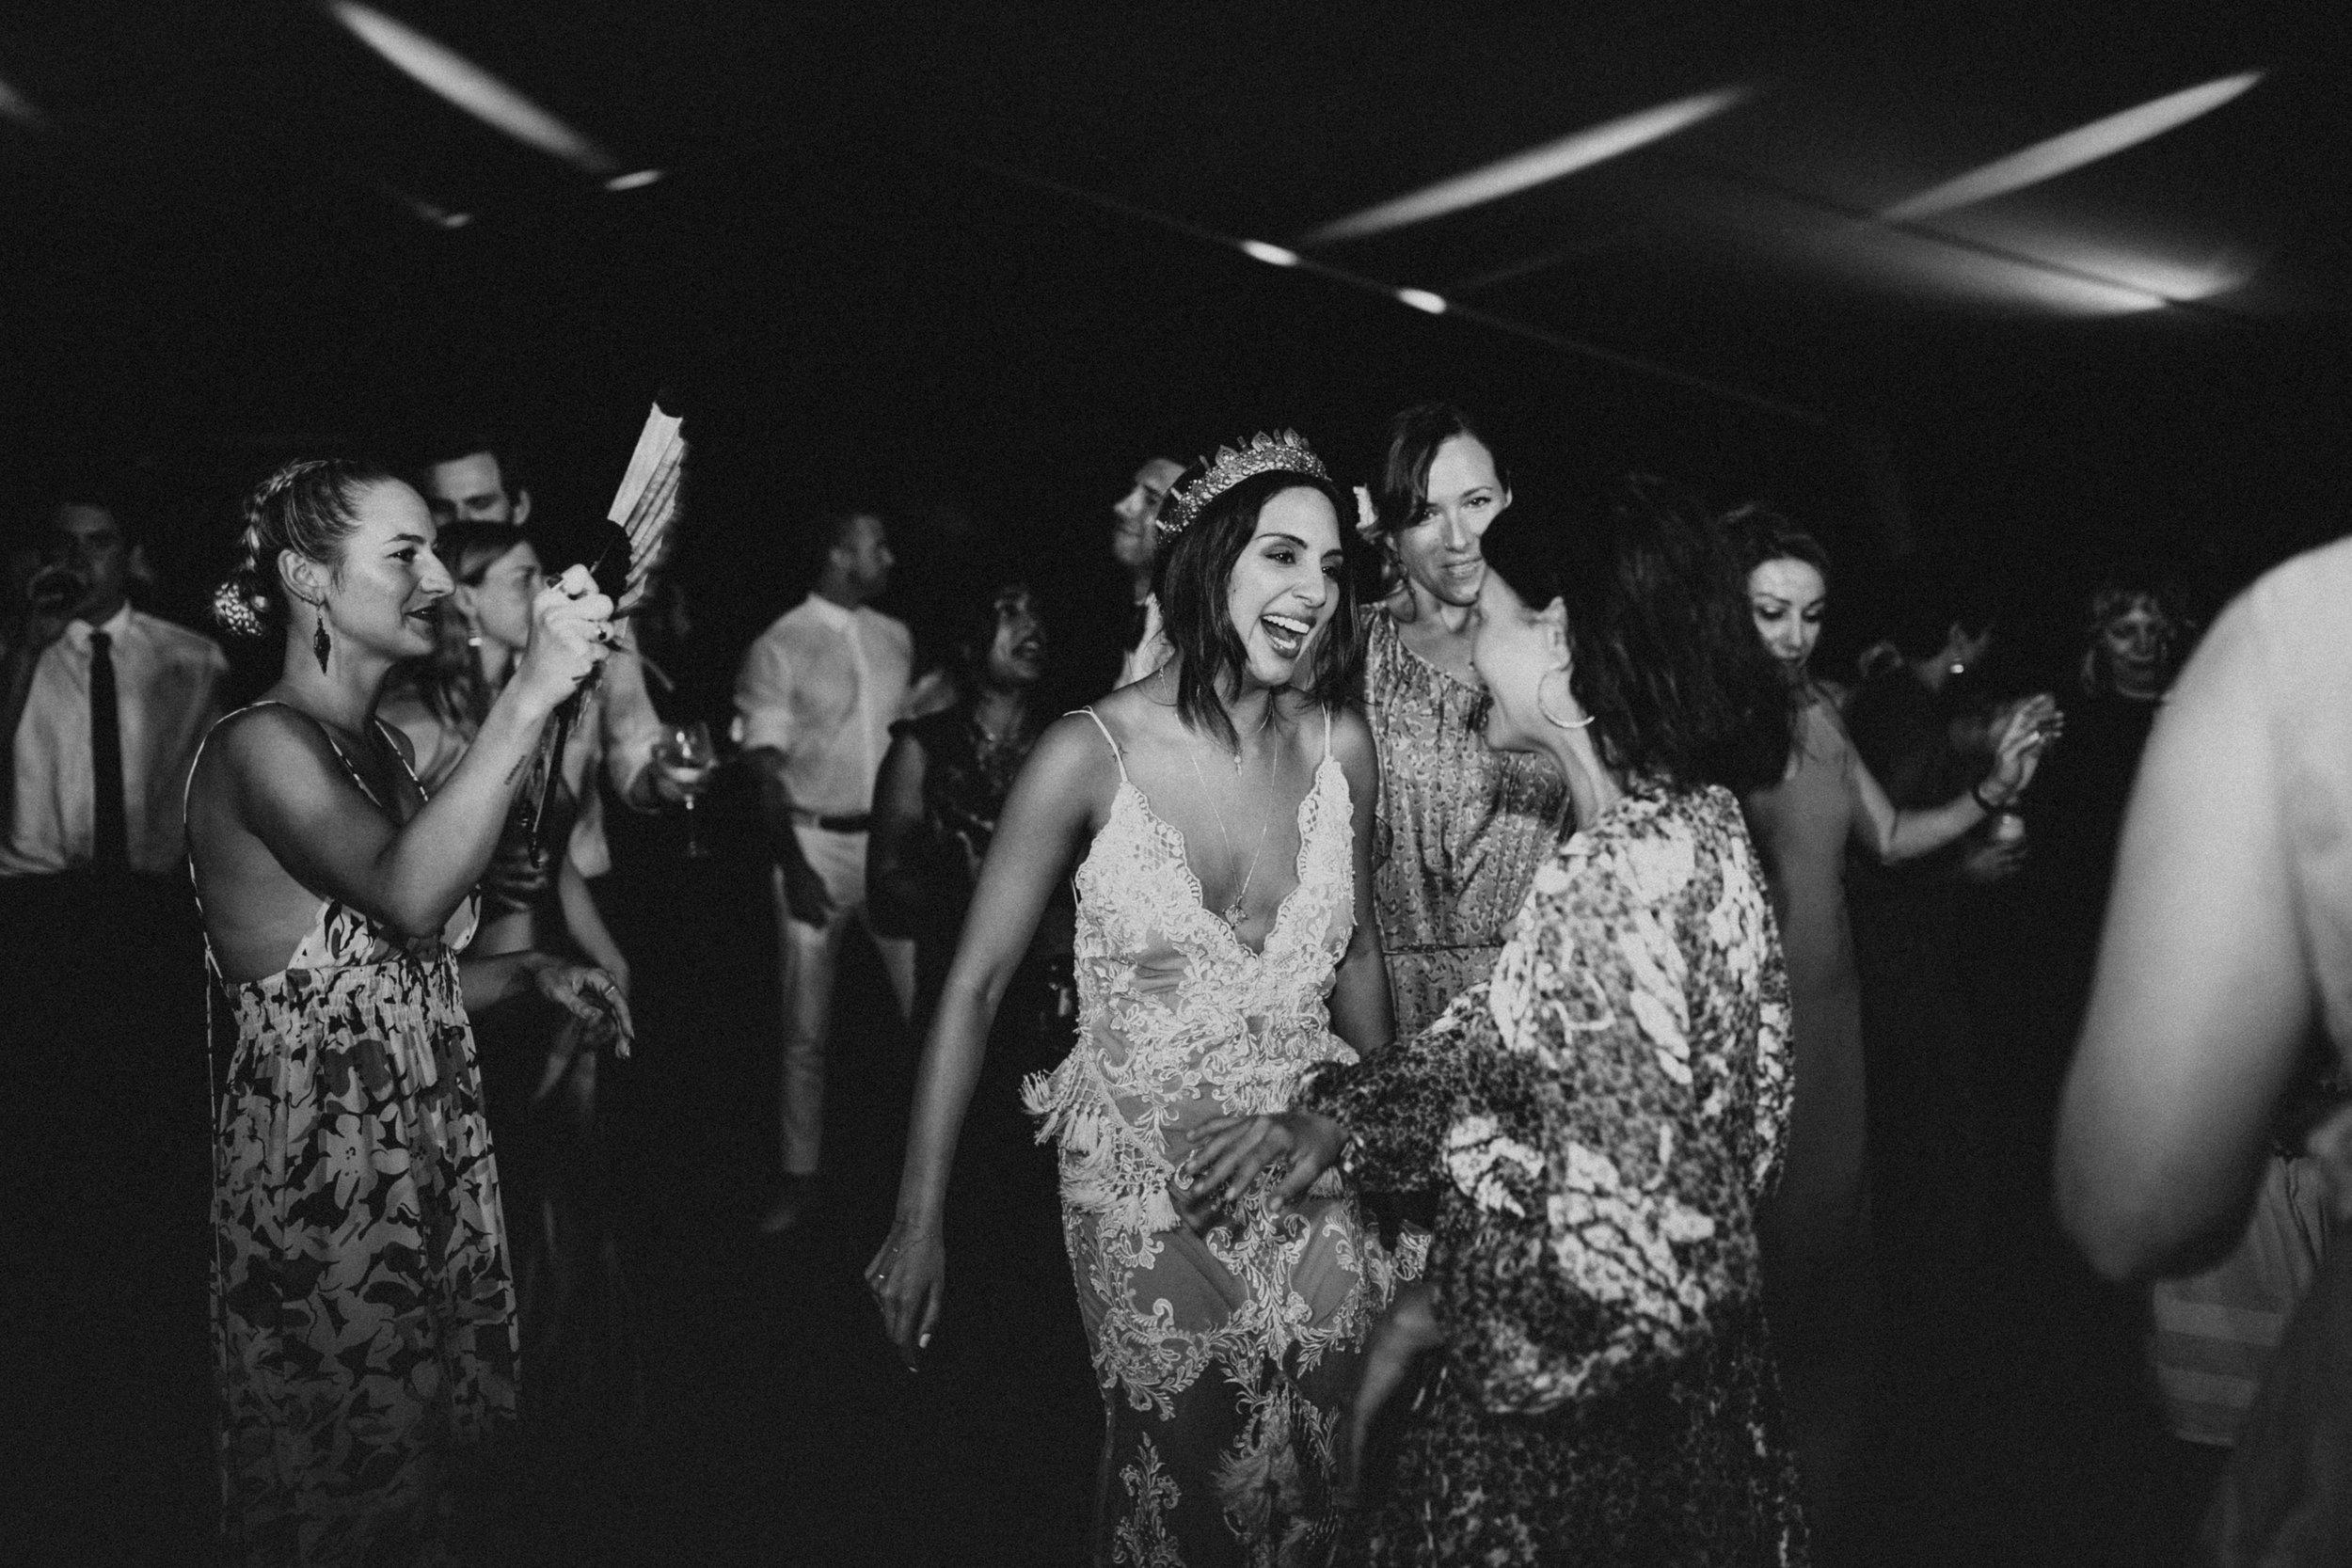 Hacienda Temozon Yucatan Mexico Wedding | Ida & Peter Emily Magers Photography-1577.jpg